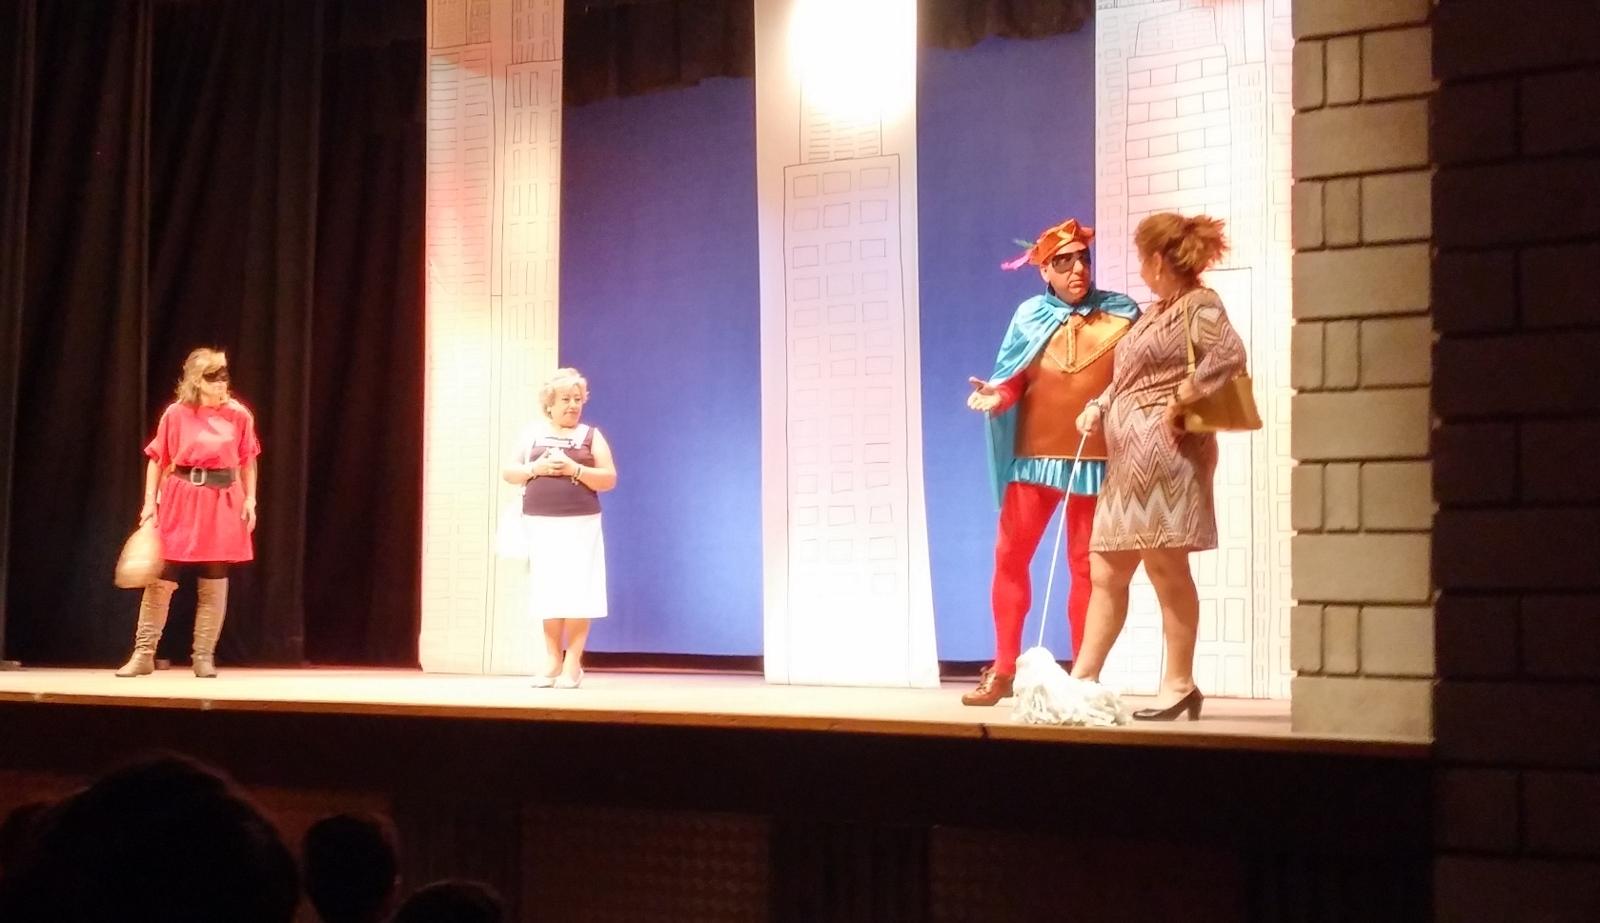 Cultura plantea el primer Festival de Teatro Infantil y Familiar